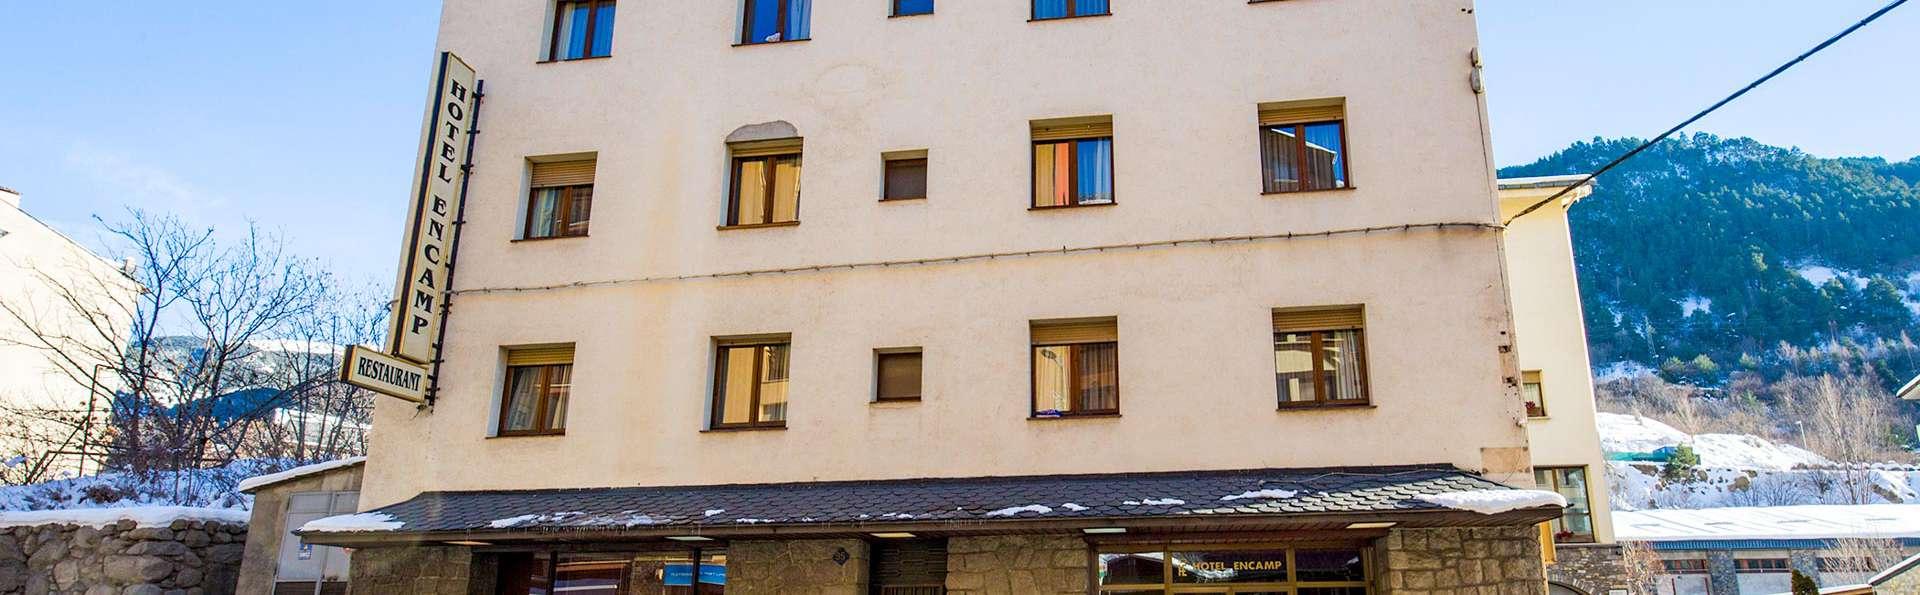 Hotel Encamp - EDIT_FRONT_02.jpg